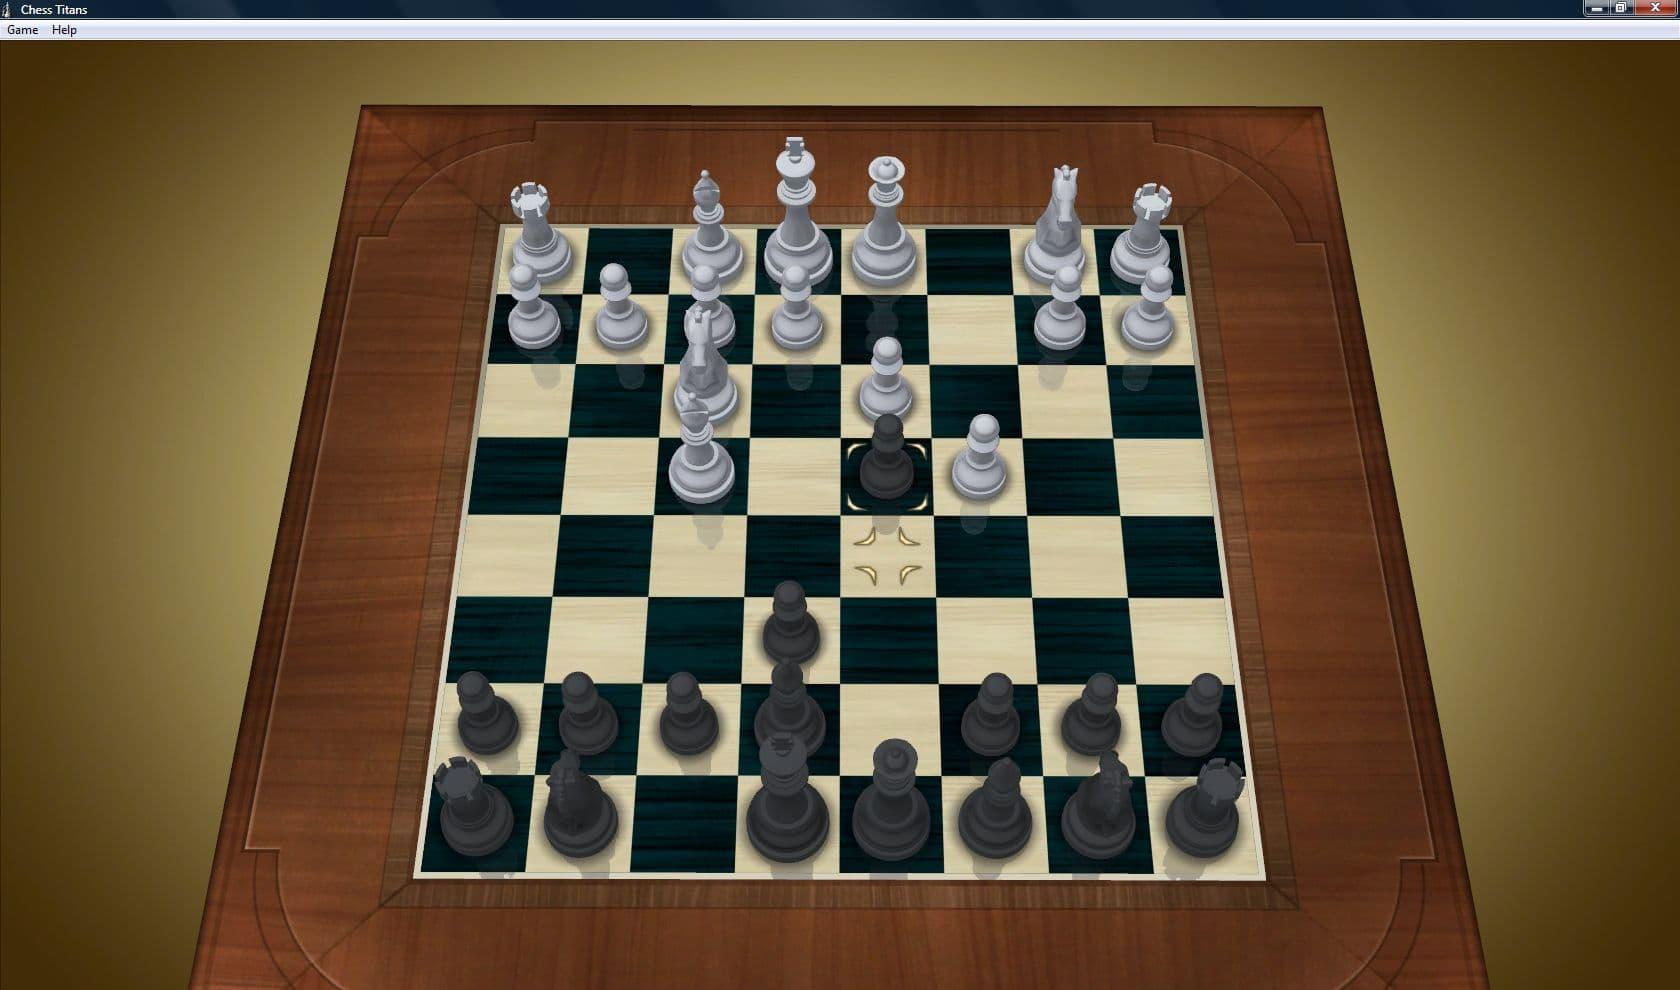 chess-titans_2_332849.jpg